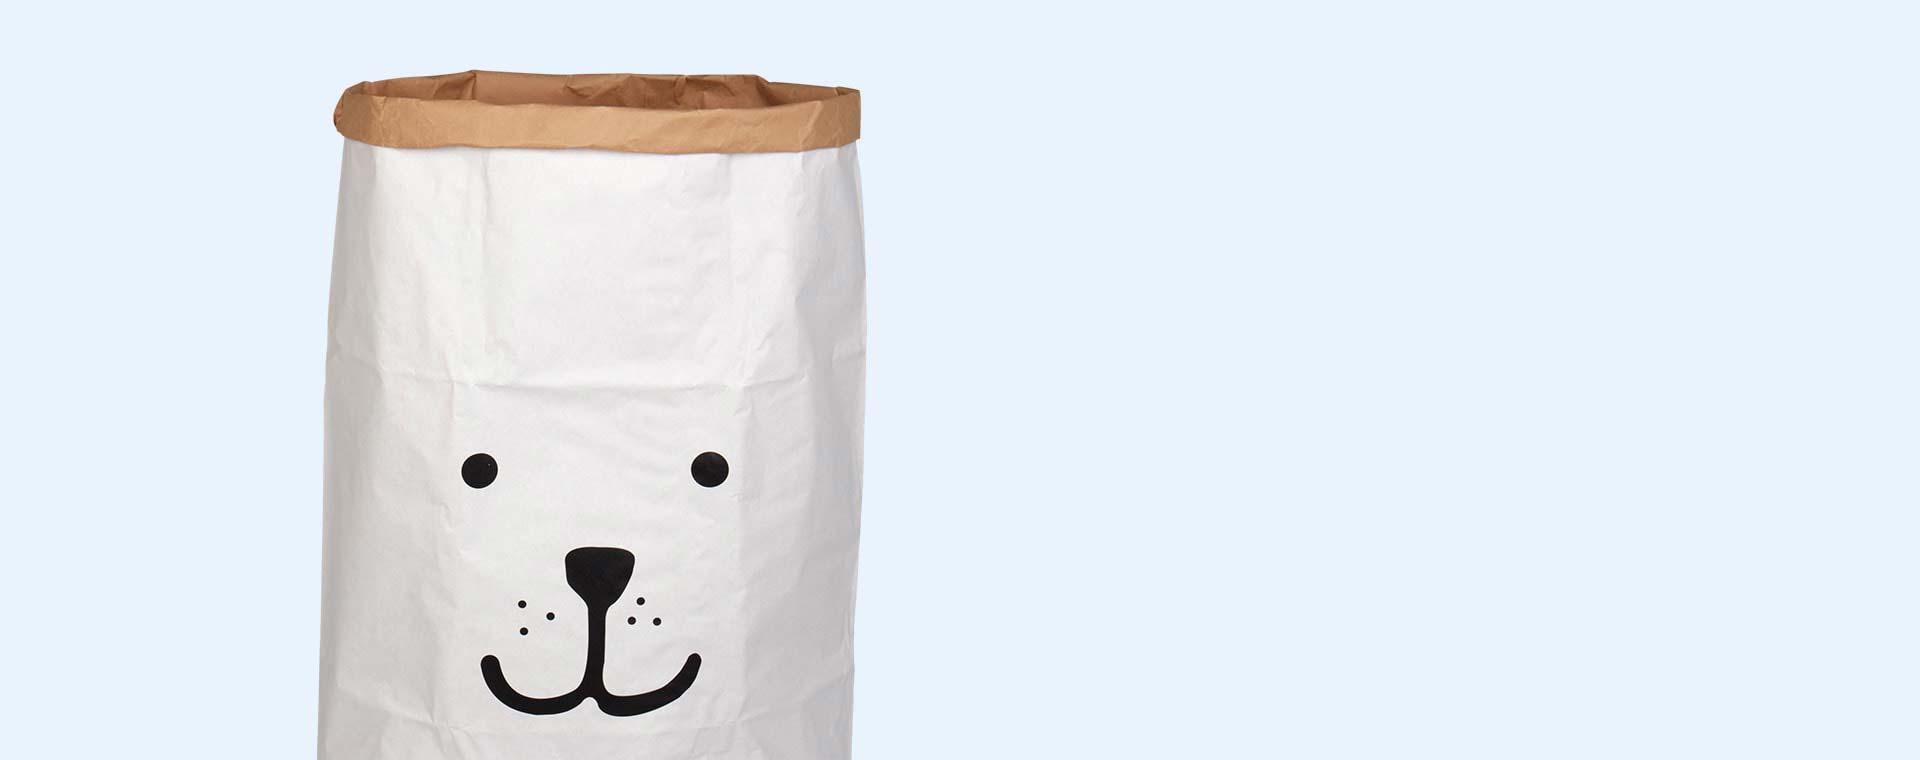 Bear Tellkiddo Large Paper Bag